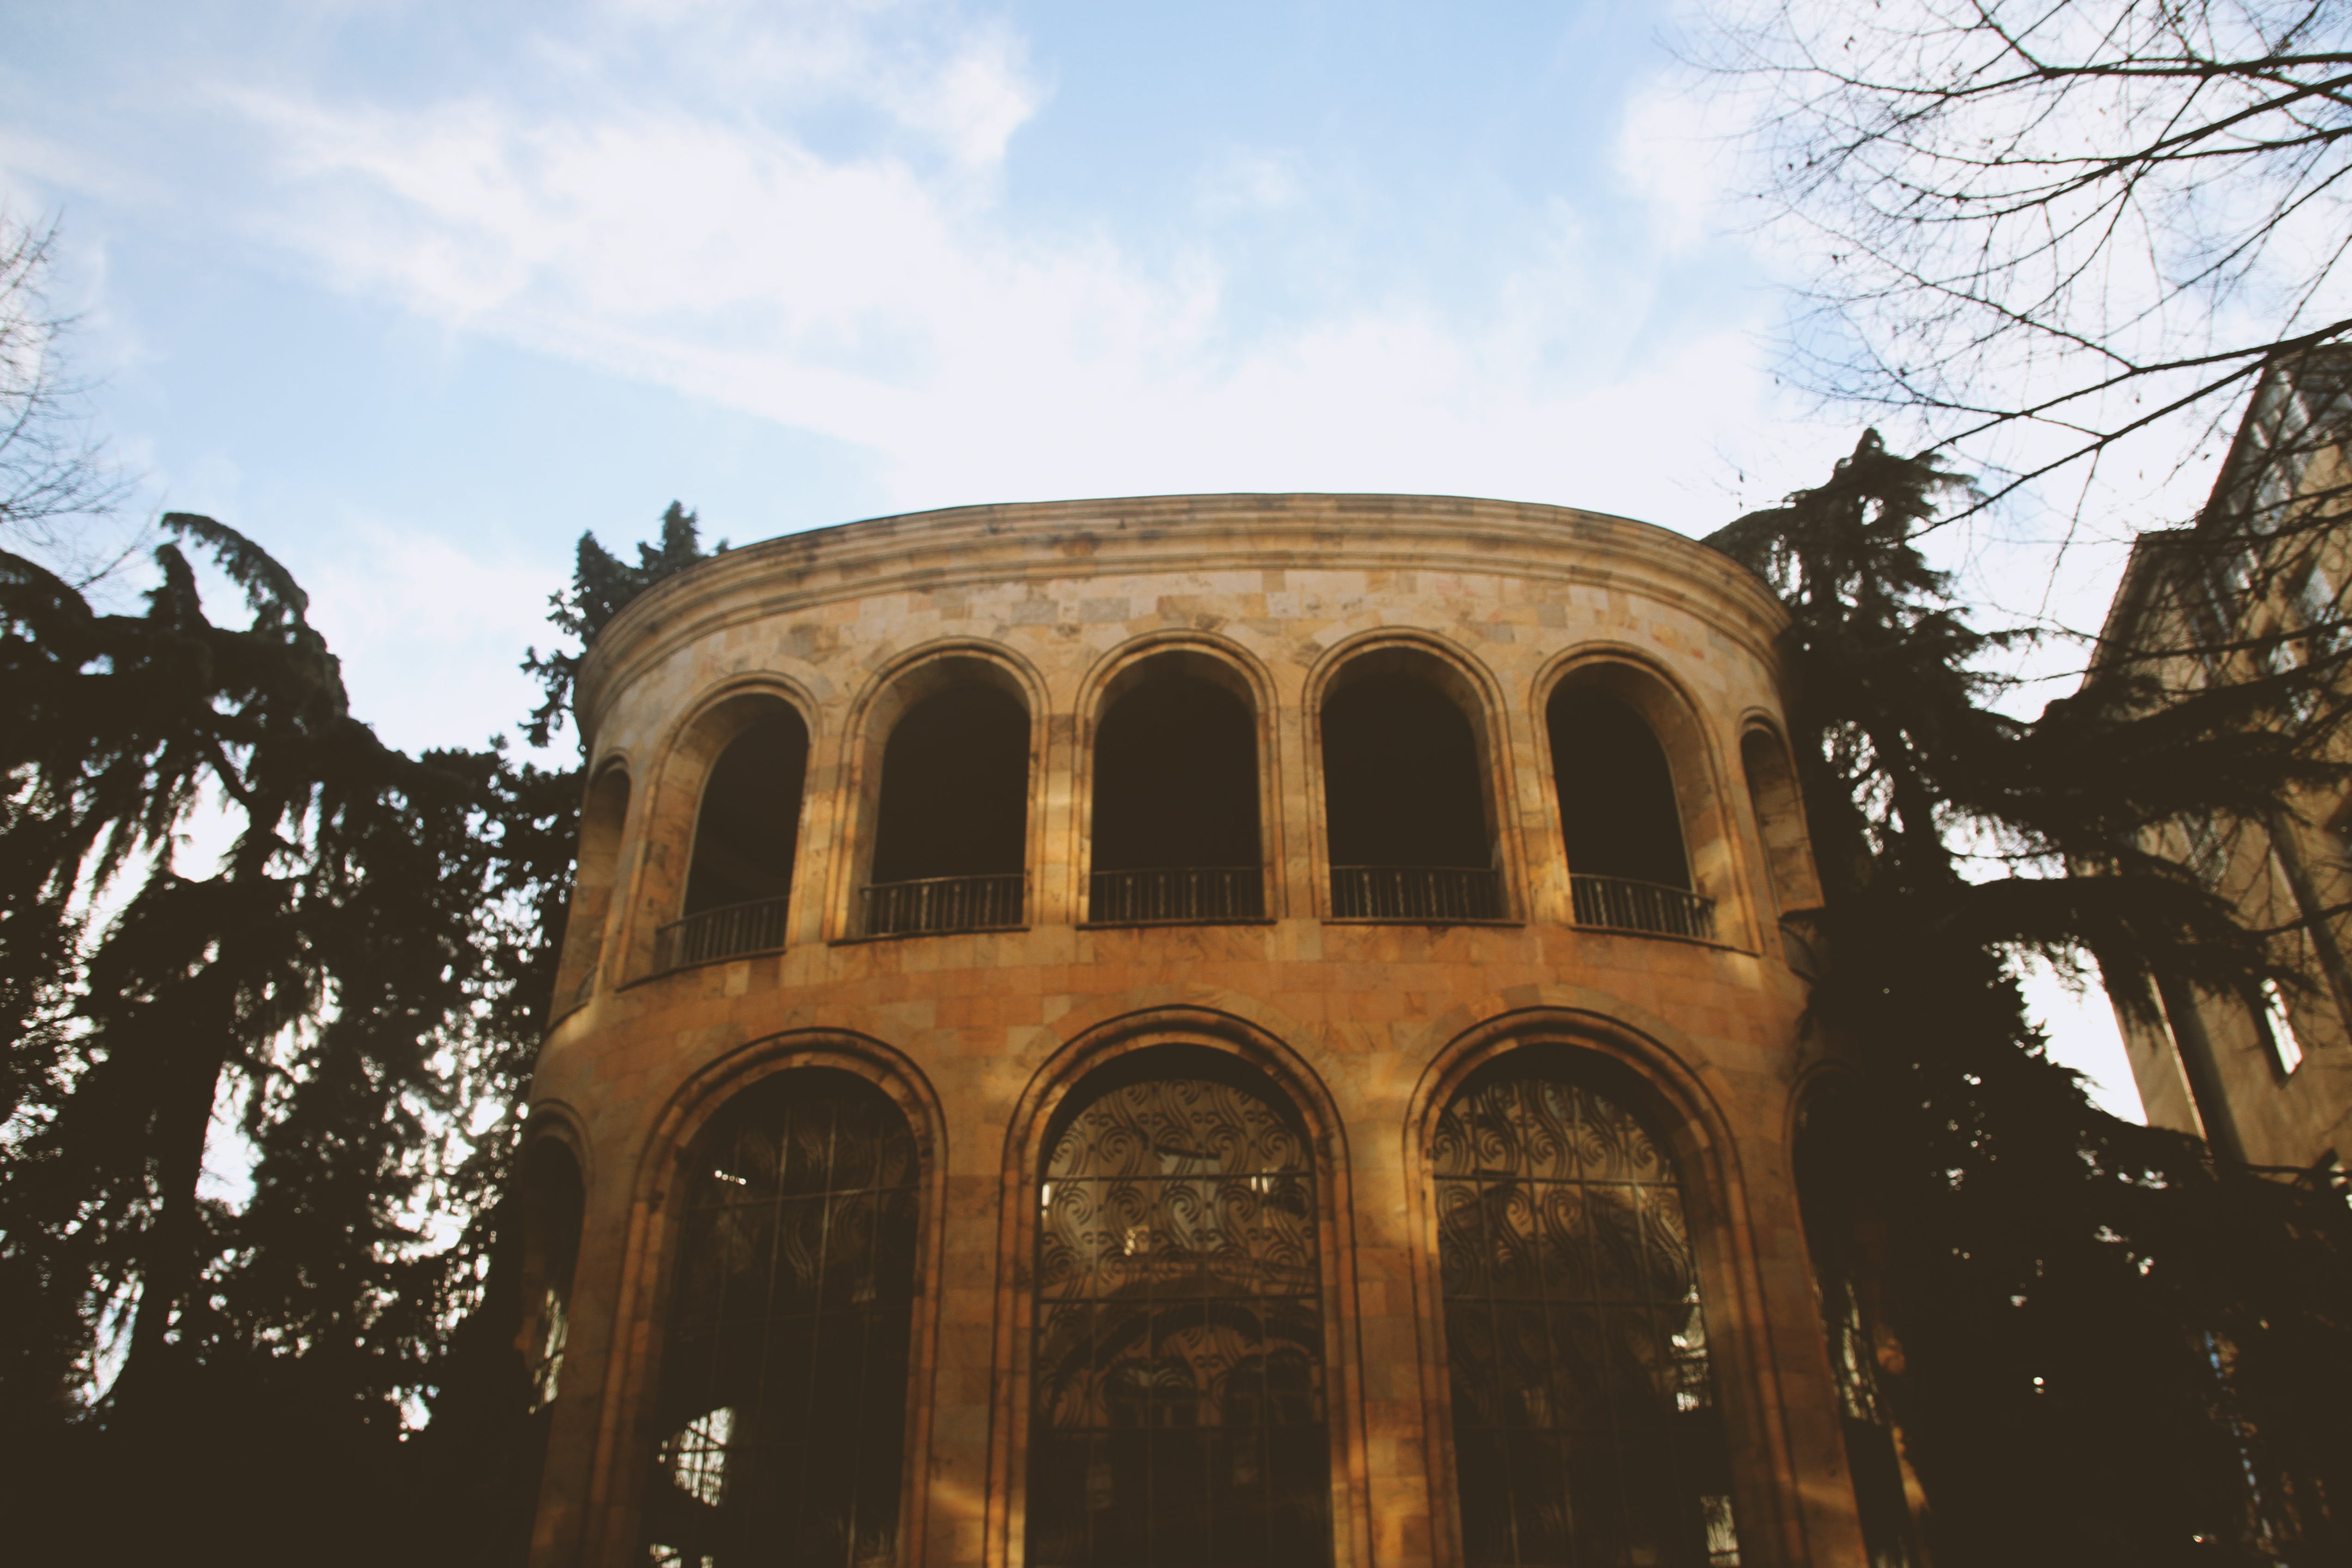 Kostnadsfri bild av antik, arkitektur, båge, byggnad